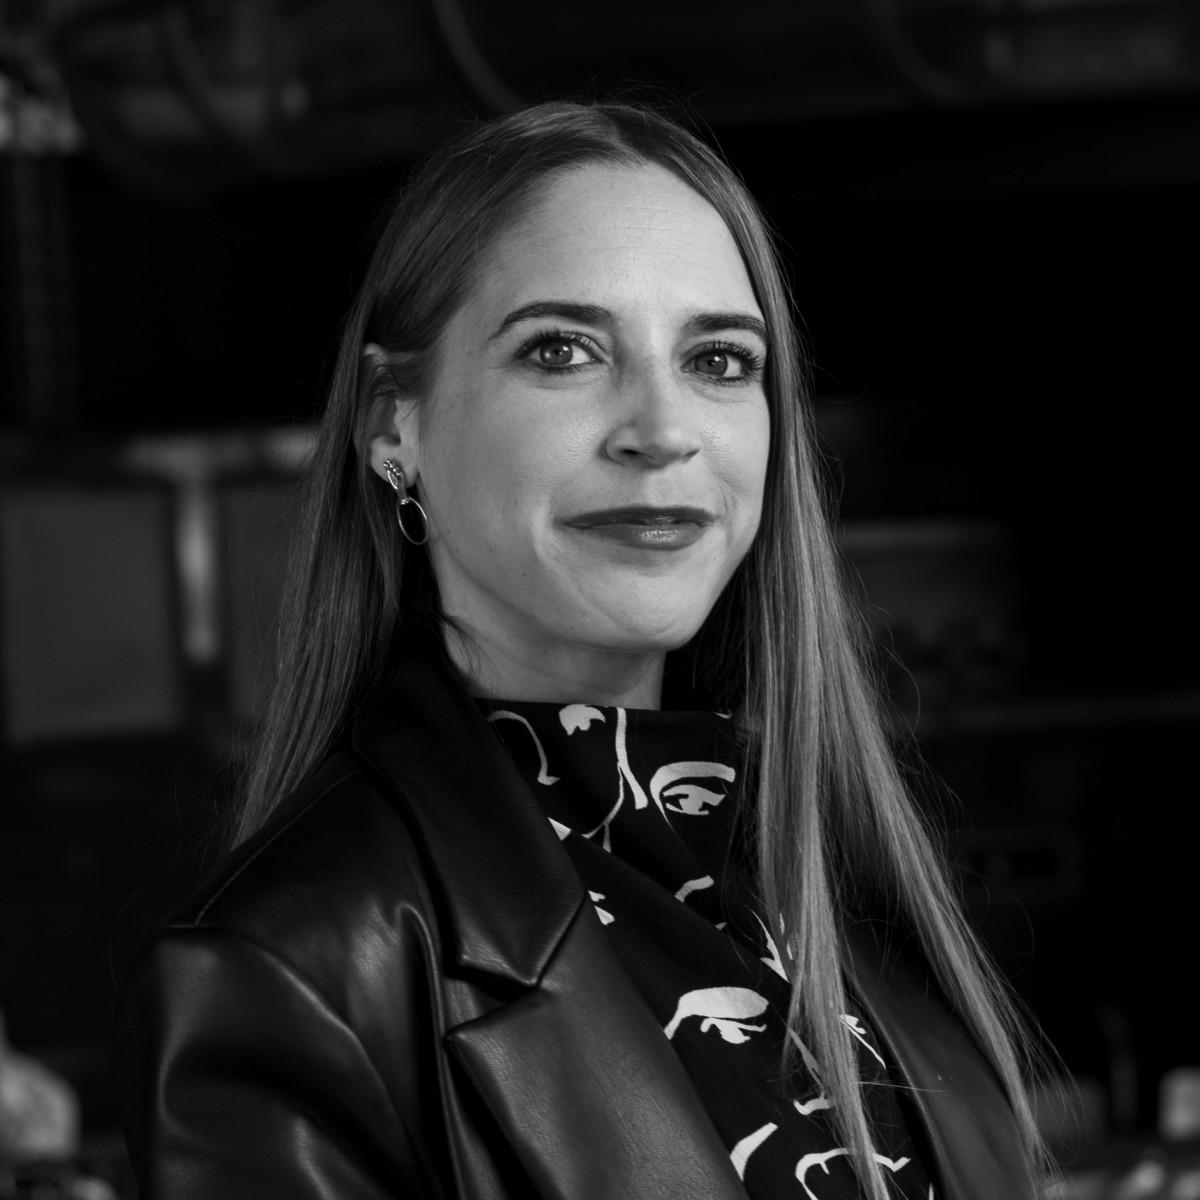 Viviane Meyer